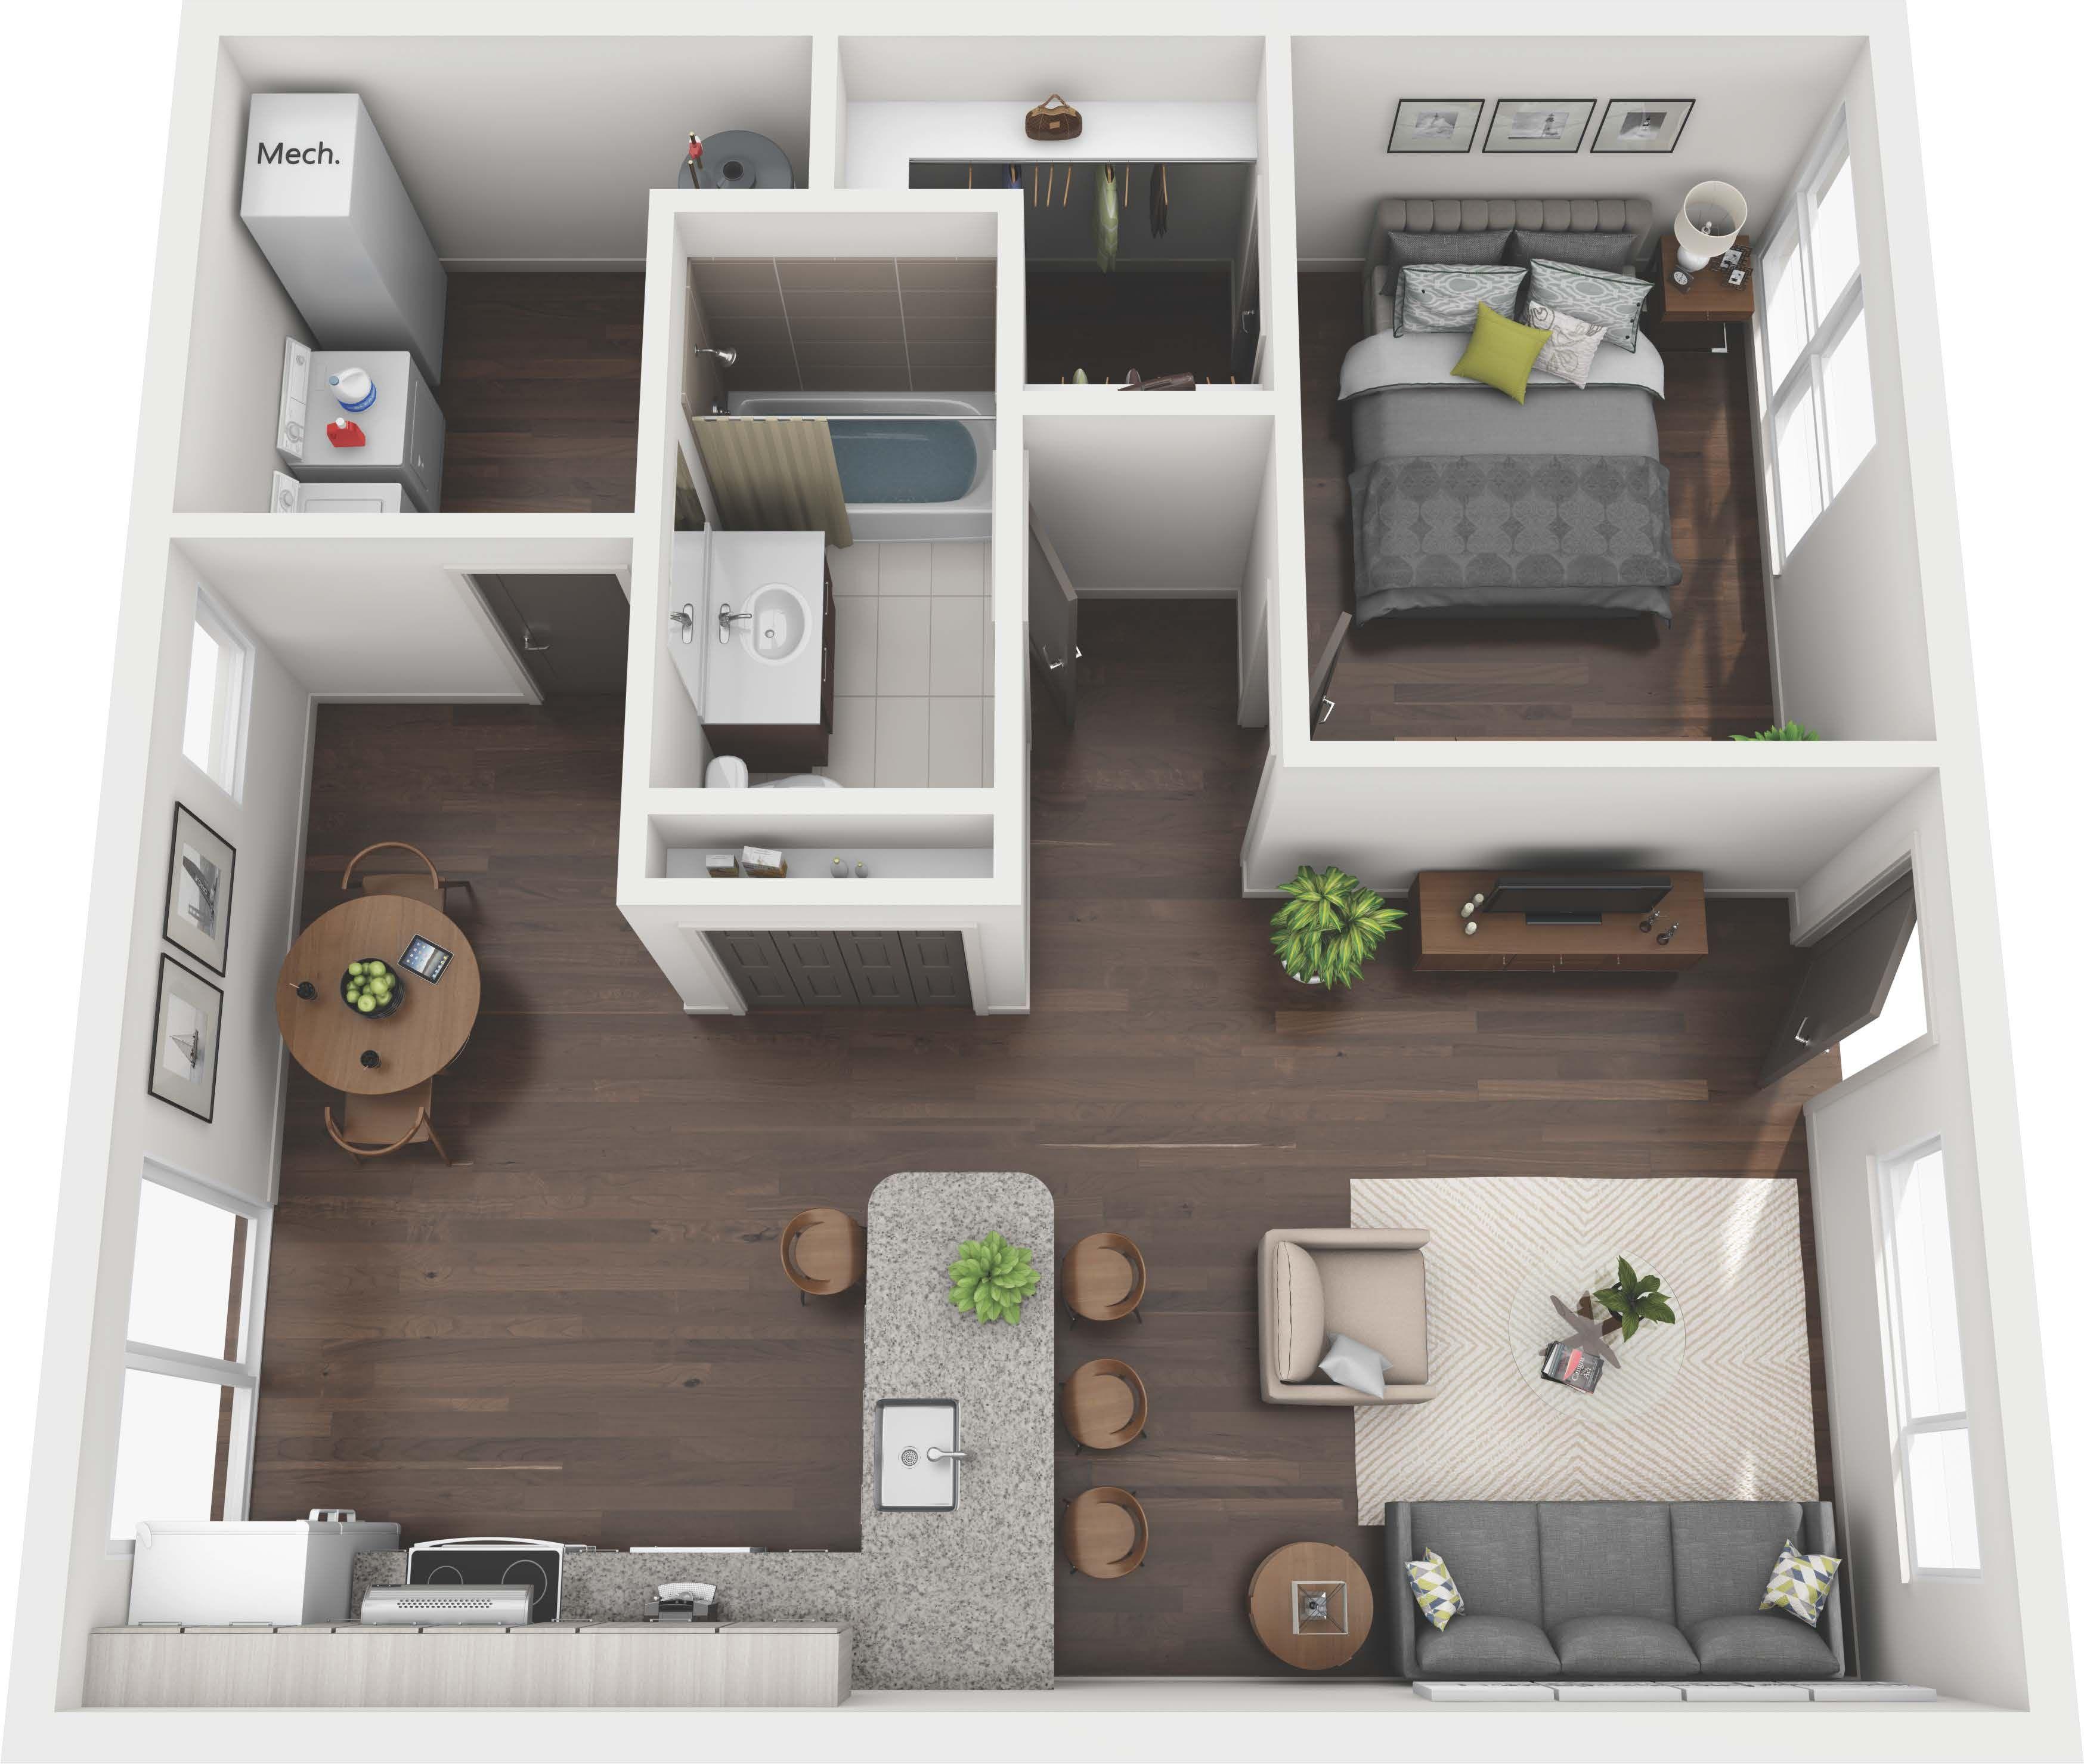 Ansley Forest Floor Plans Studio 1 2 3 Bedroom Atlanta Apartments Sims House House Floor Design Sims House Plans